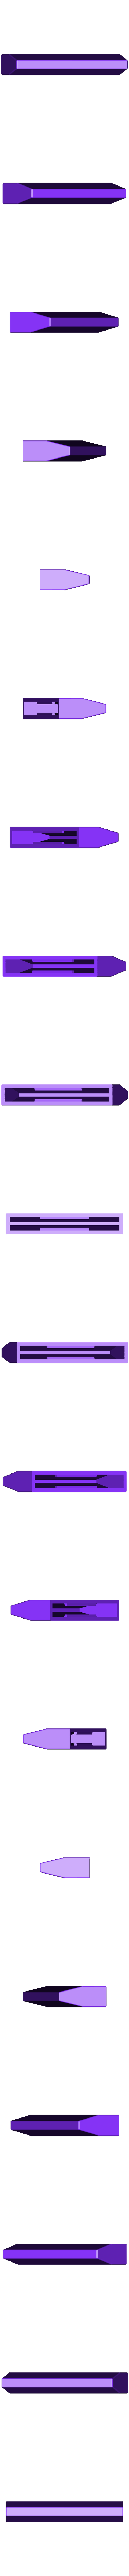 scraper_cap.STL Download free STL file Scraper With Cap • 3D printing template, alexberkowitz